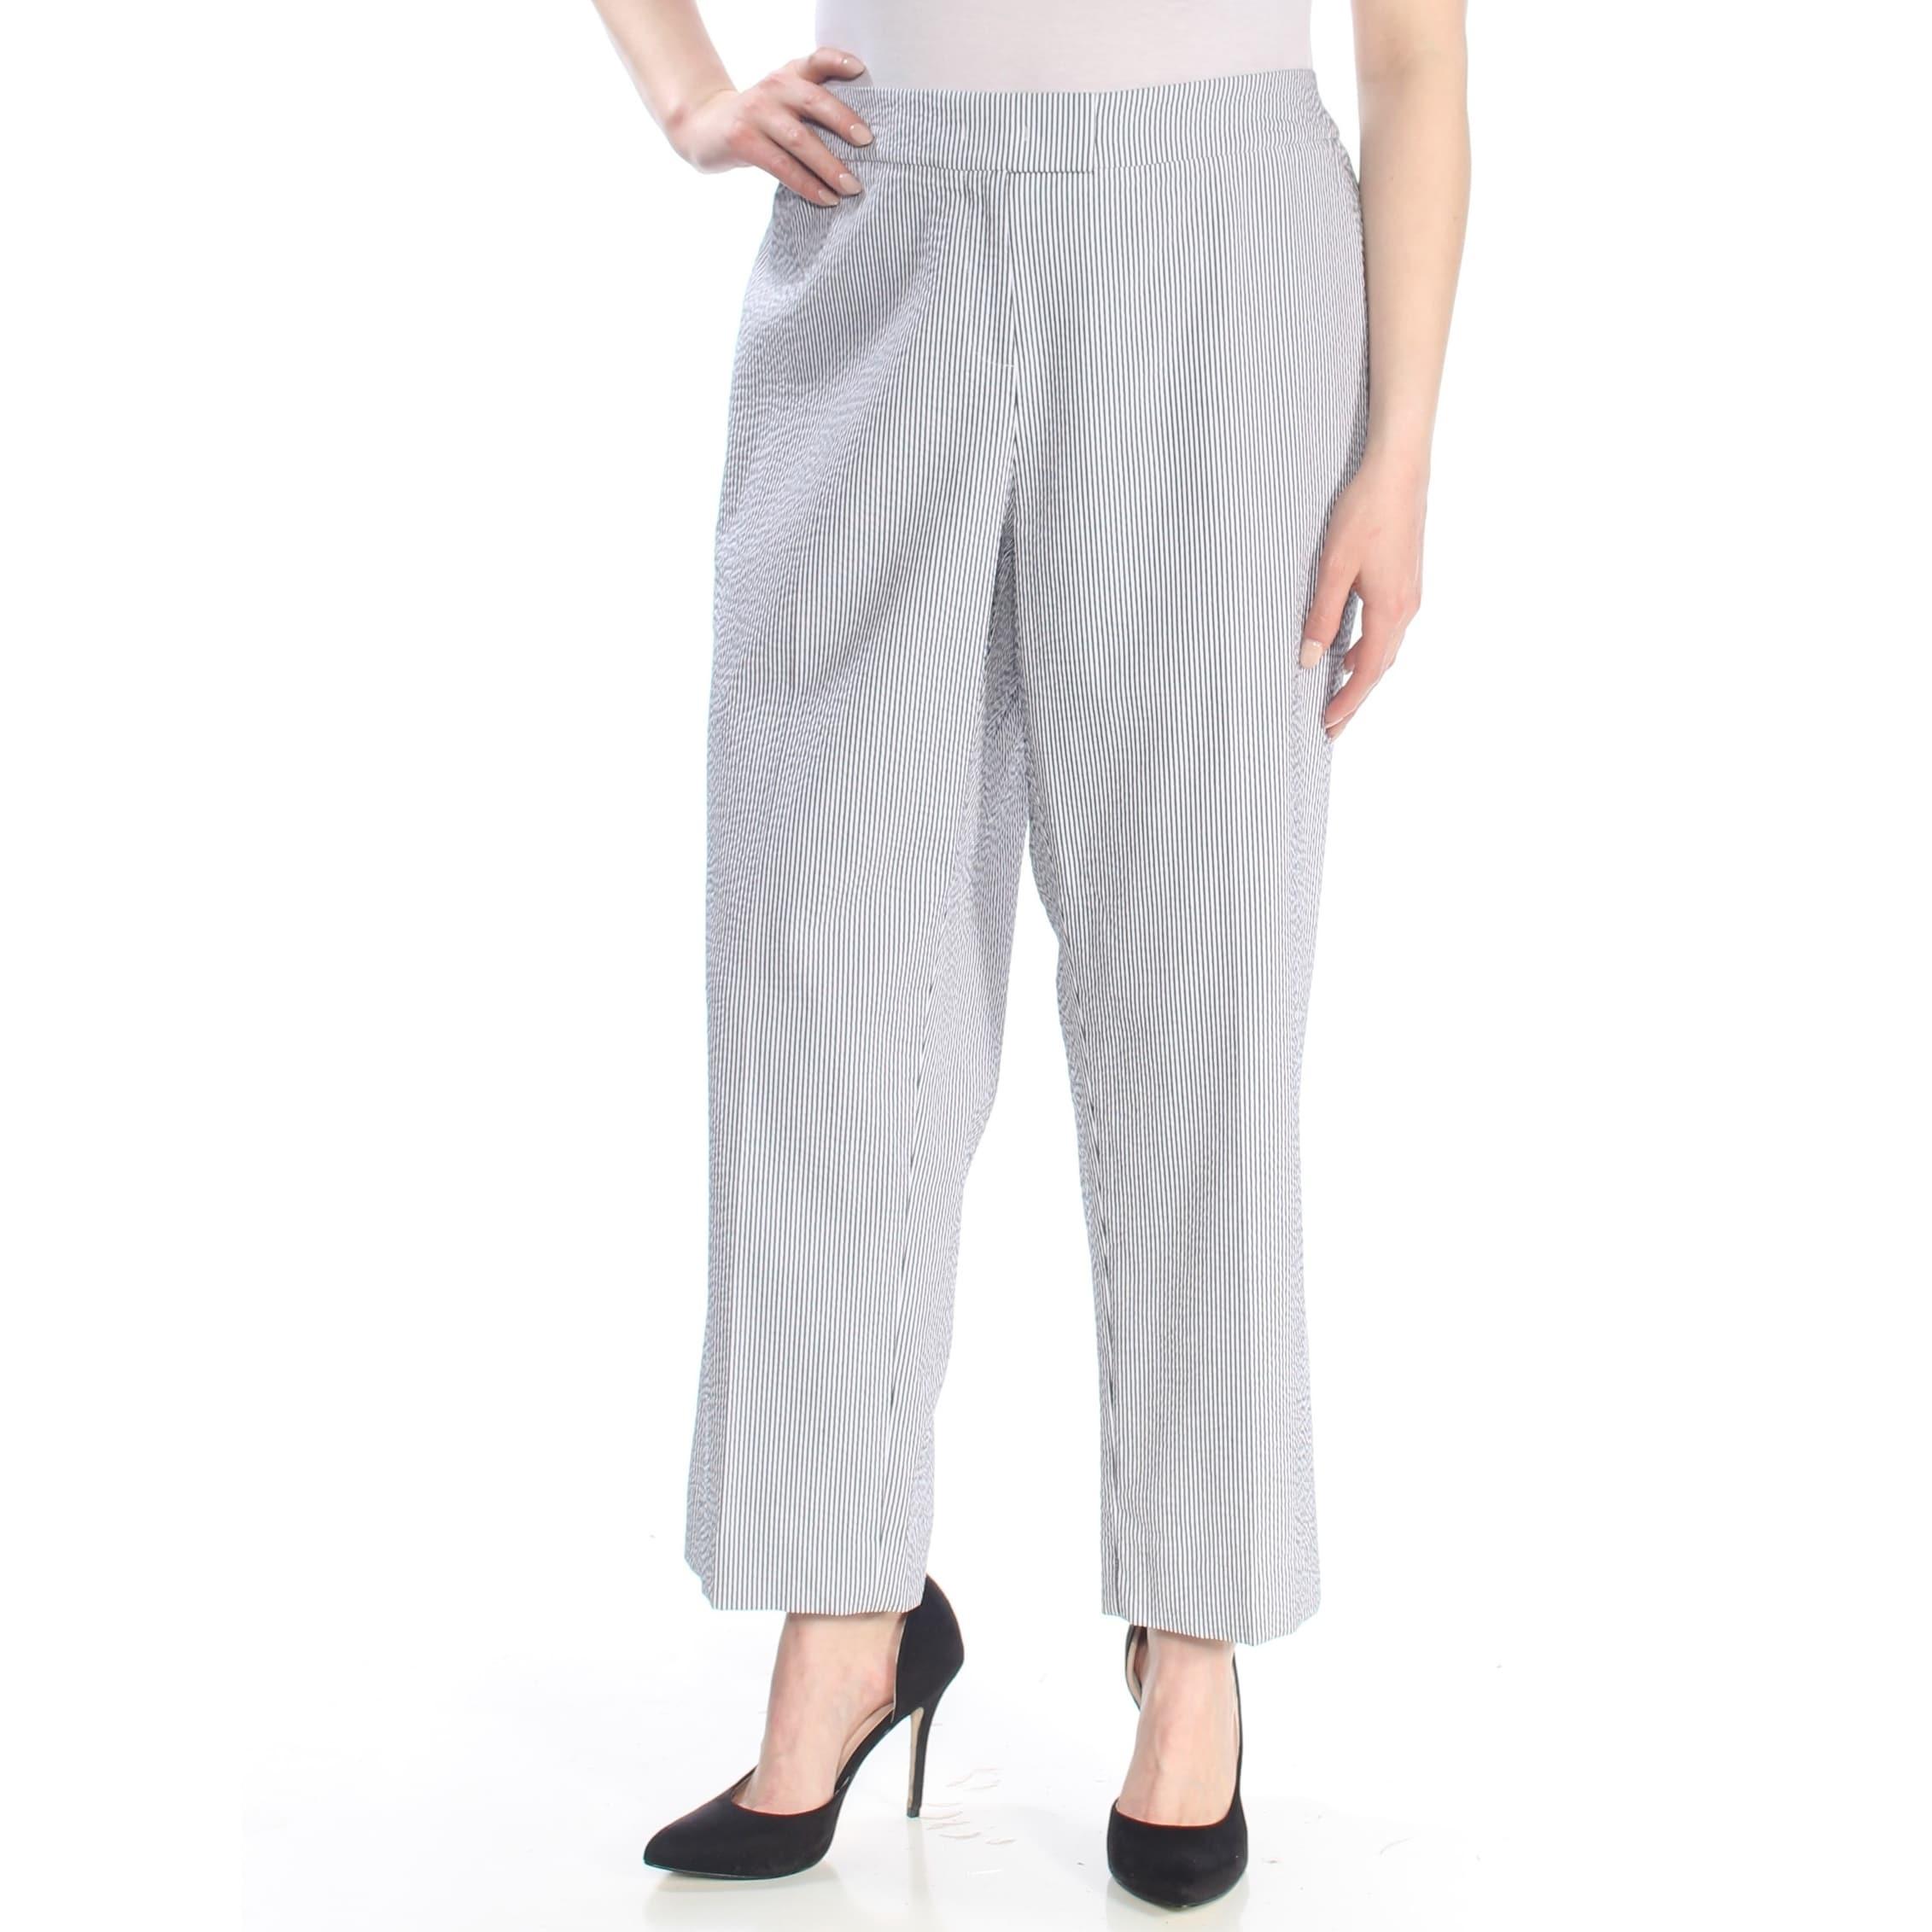 Shop Anne Klein Womens Black Seersucker Striped Pants Plus Size